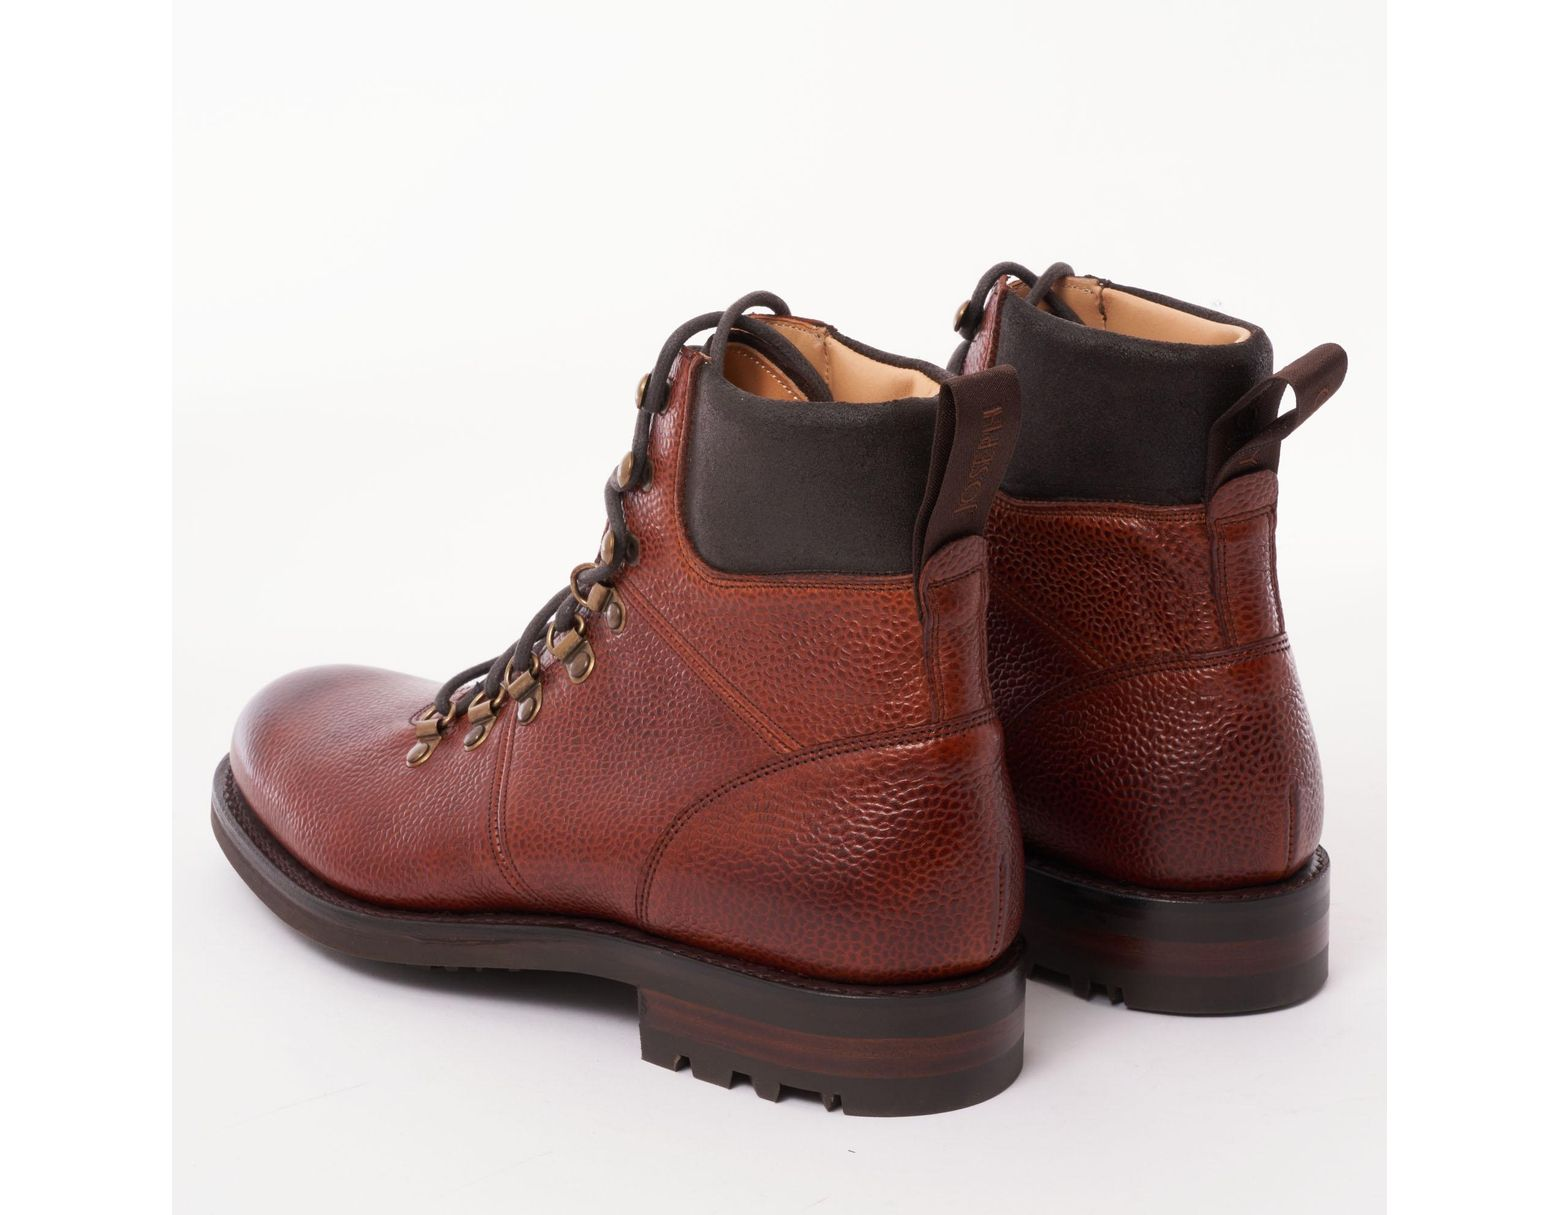 fc508ba7dfc Men's Brown Mahogany Leather Ingleborough Hiking Boots